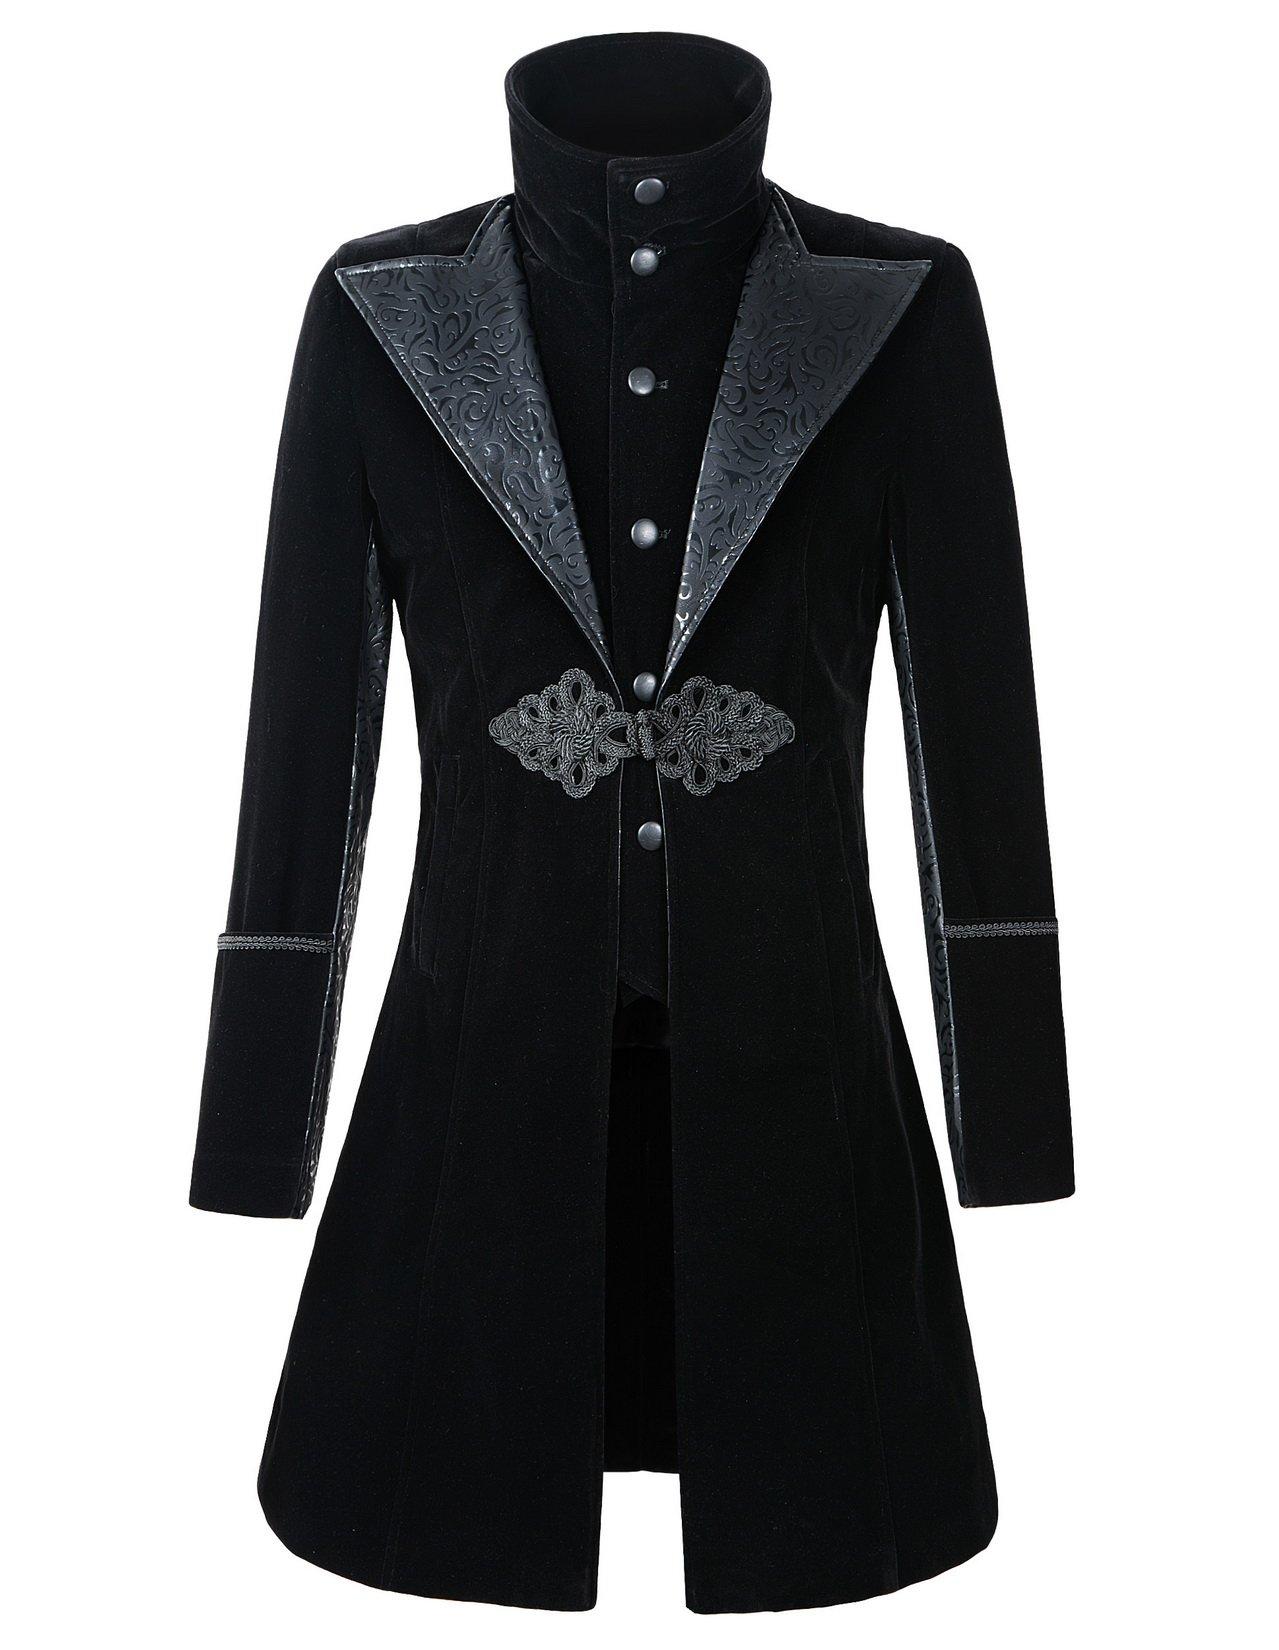 DarcChic Mens Velvet Gothic Leather-Lapel Trench Coat Steampunk Victorian 3